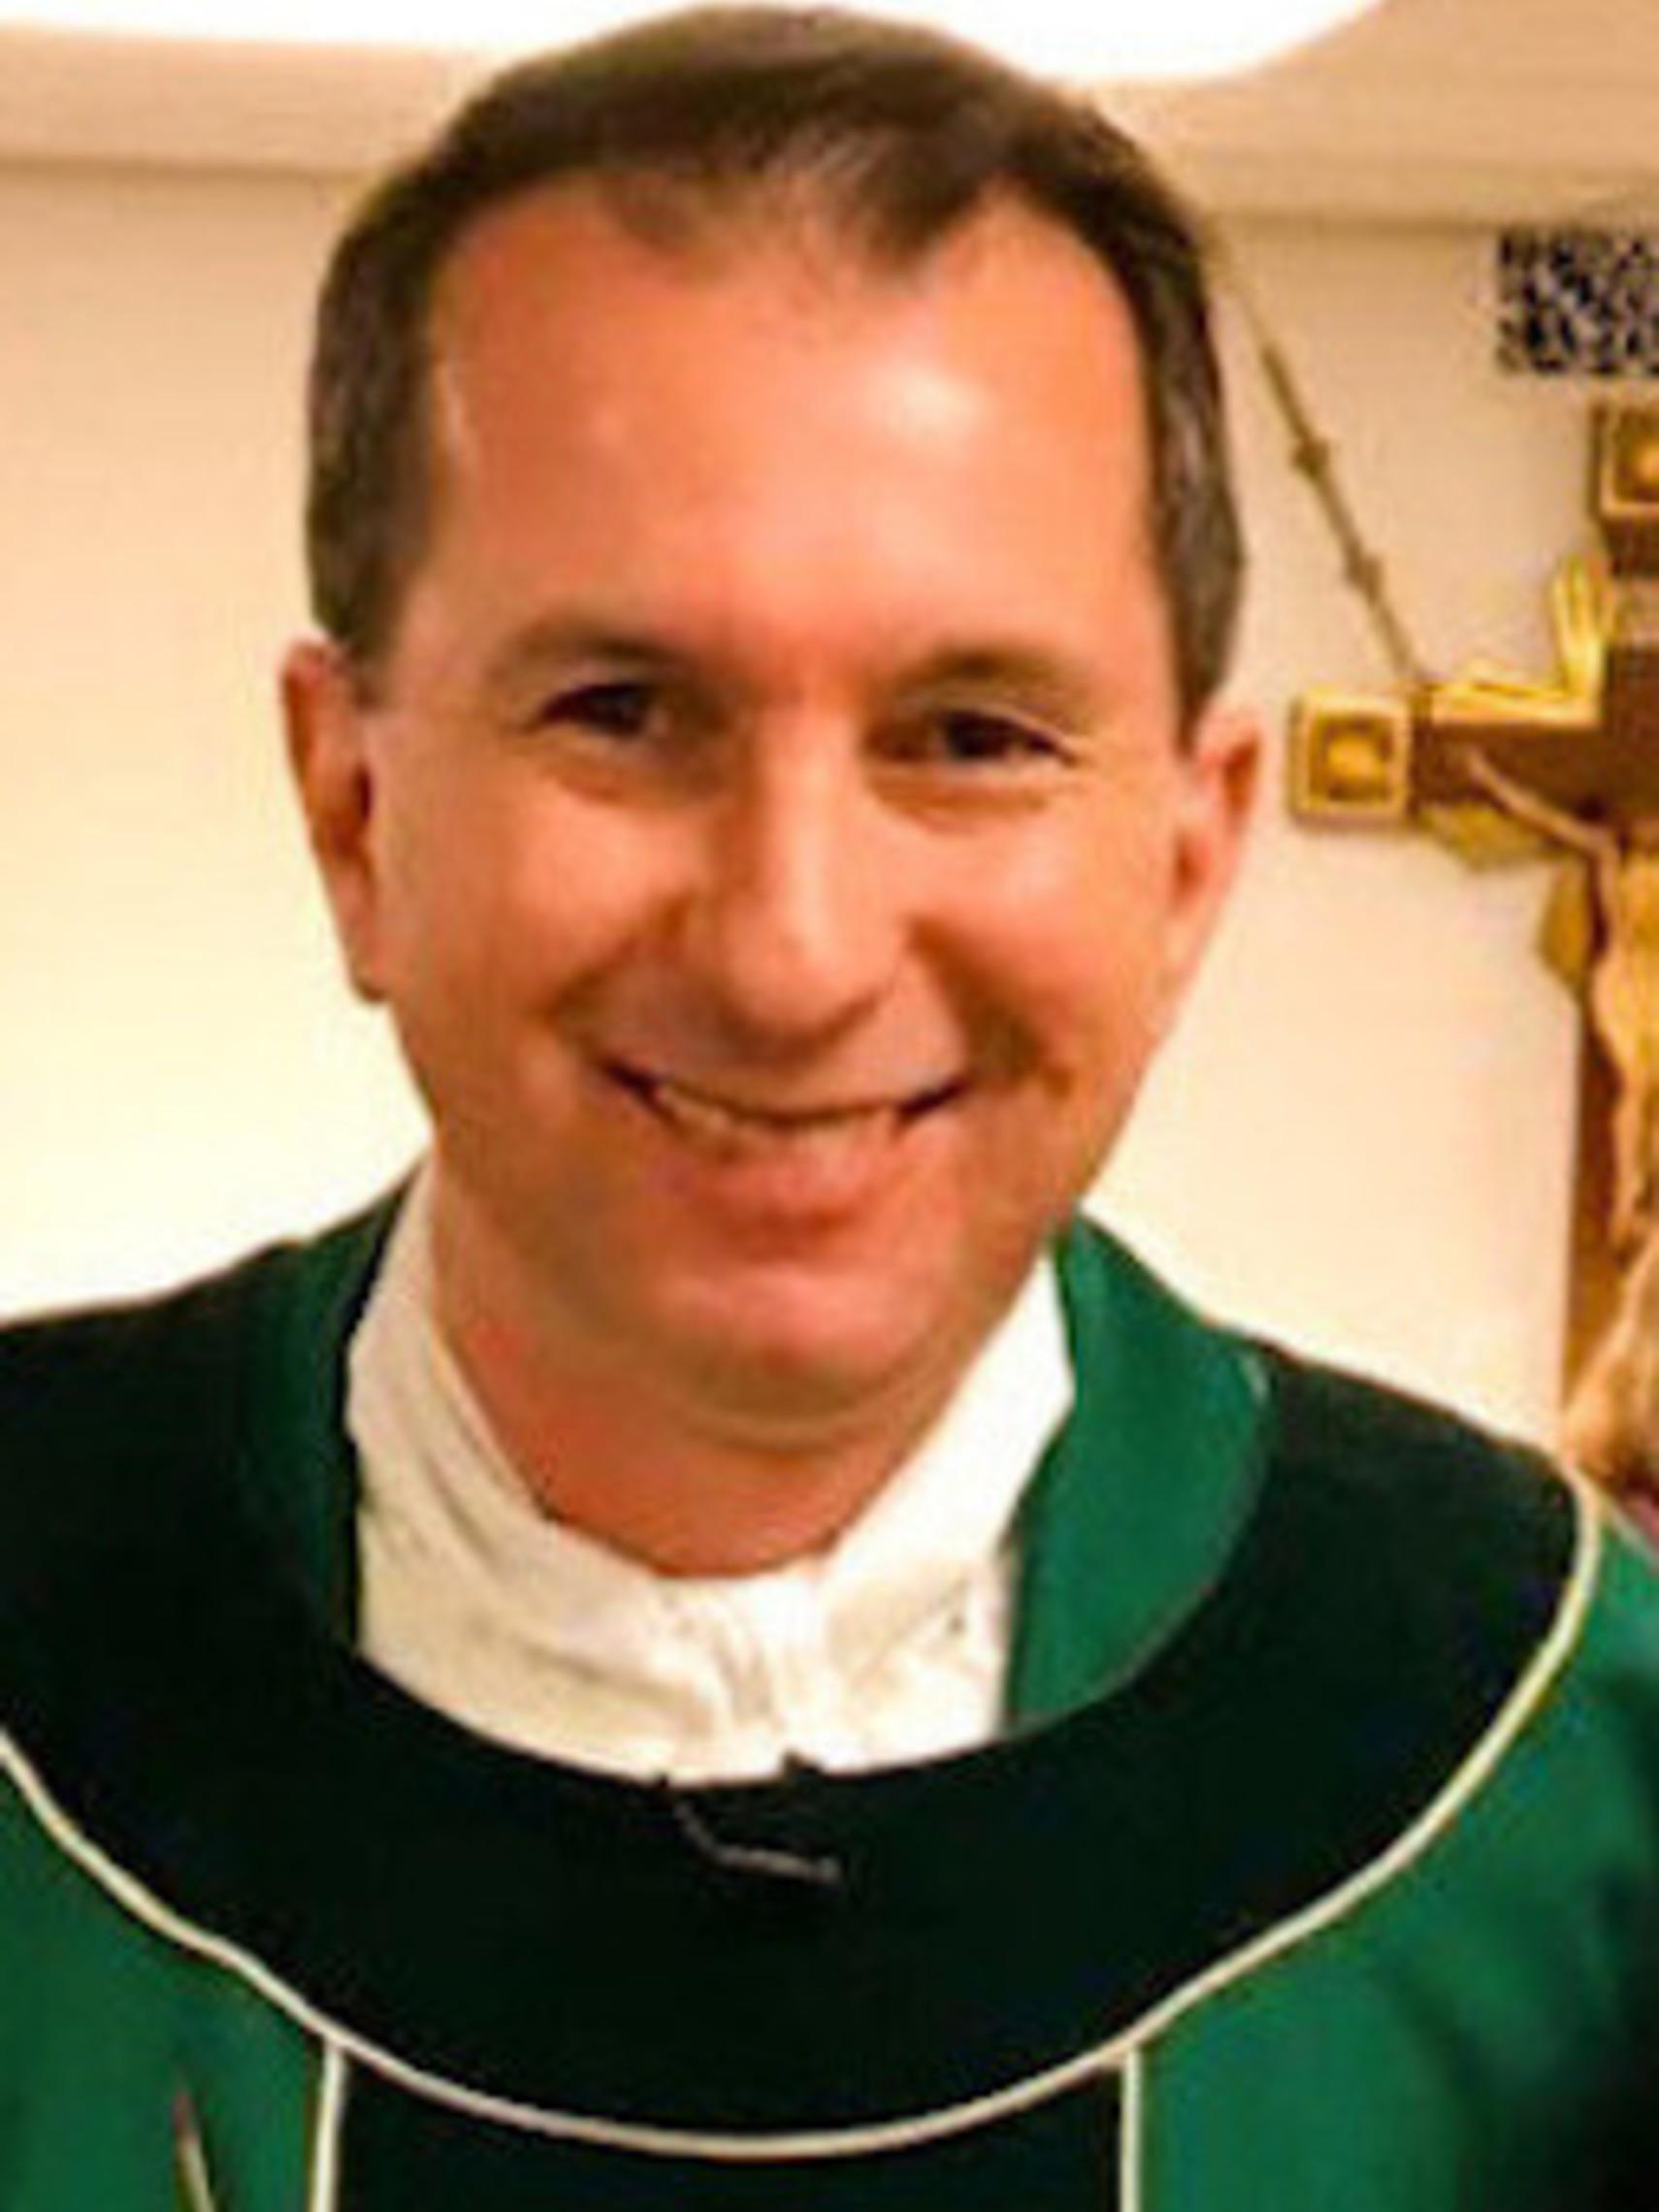 Fr. Lance Harlow